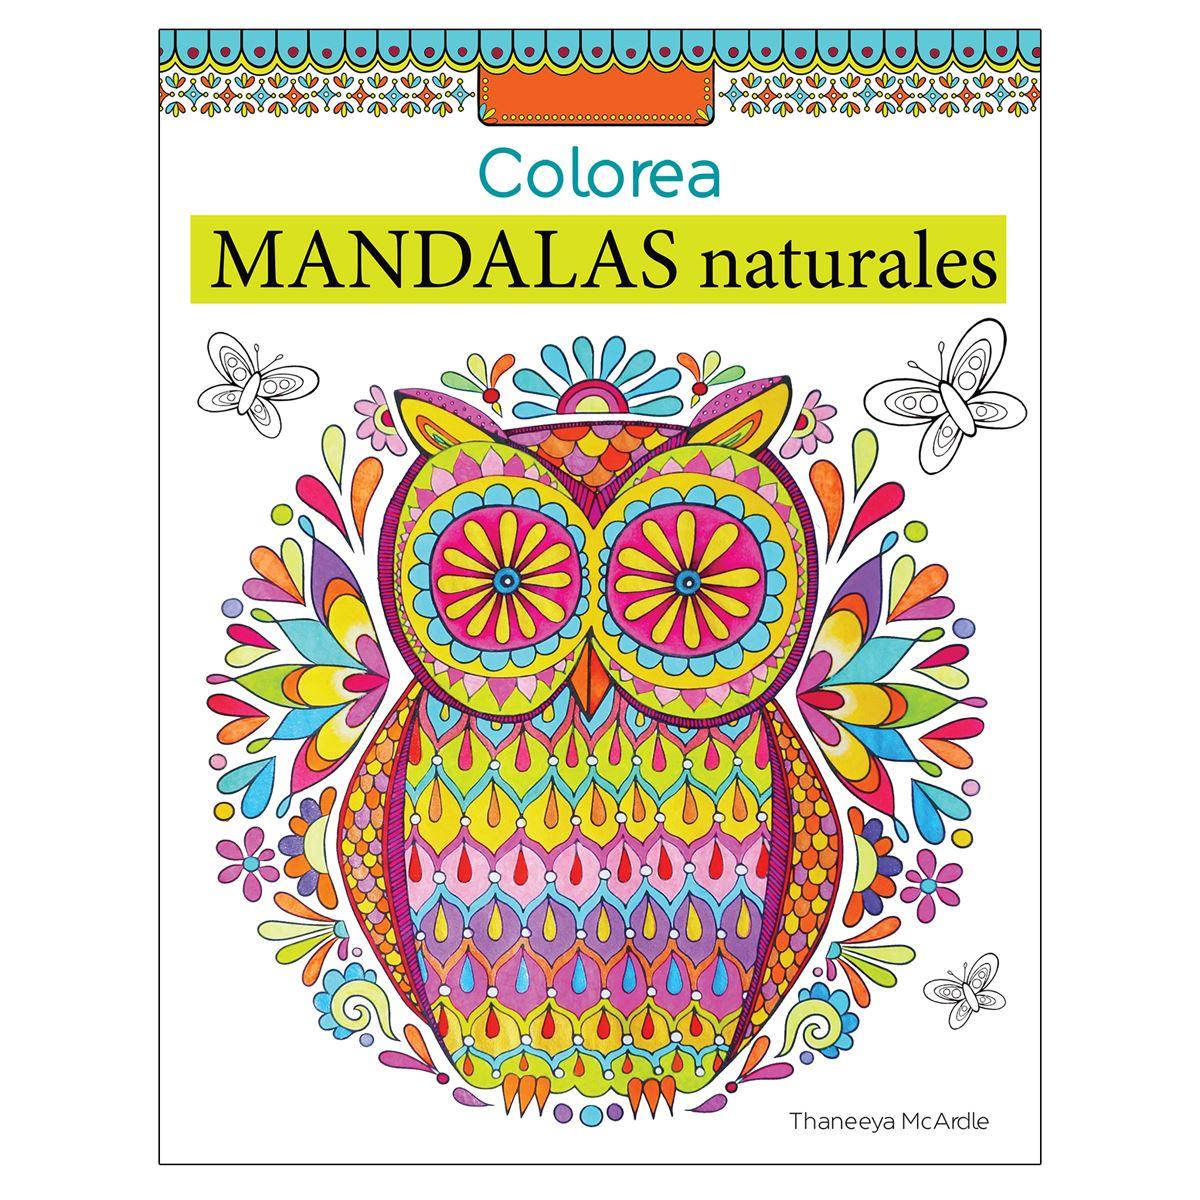 Colorea Mandalas Naturales